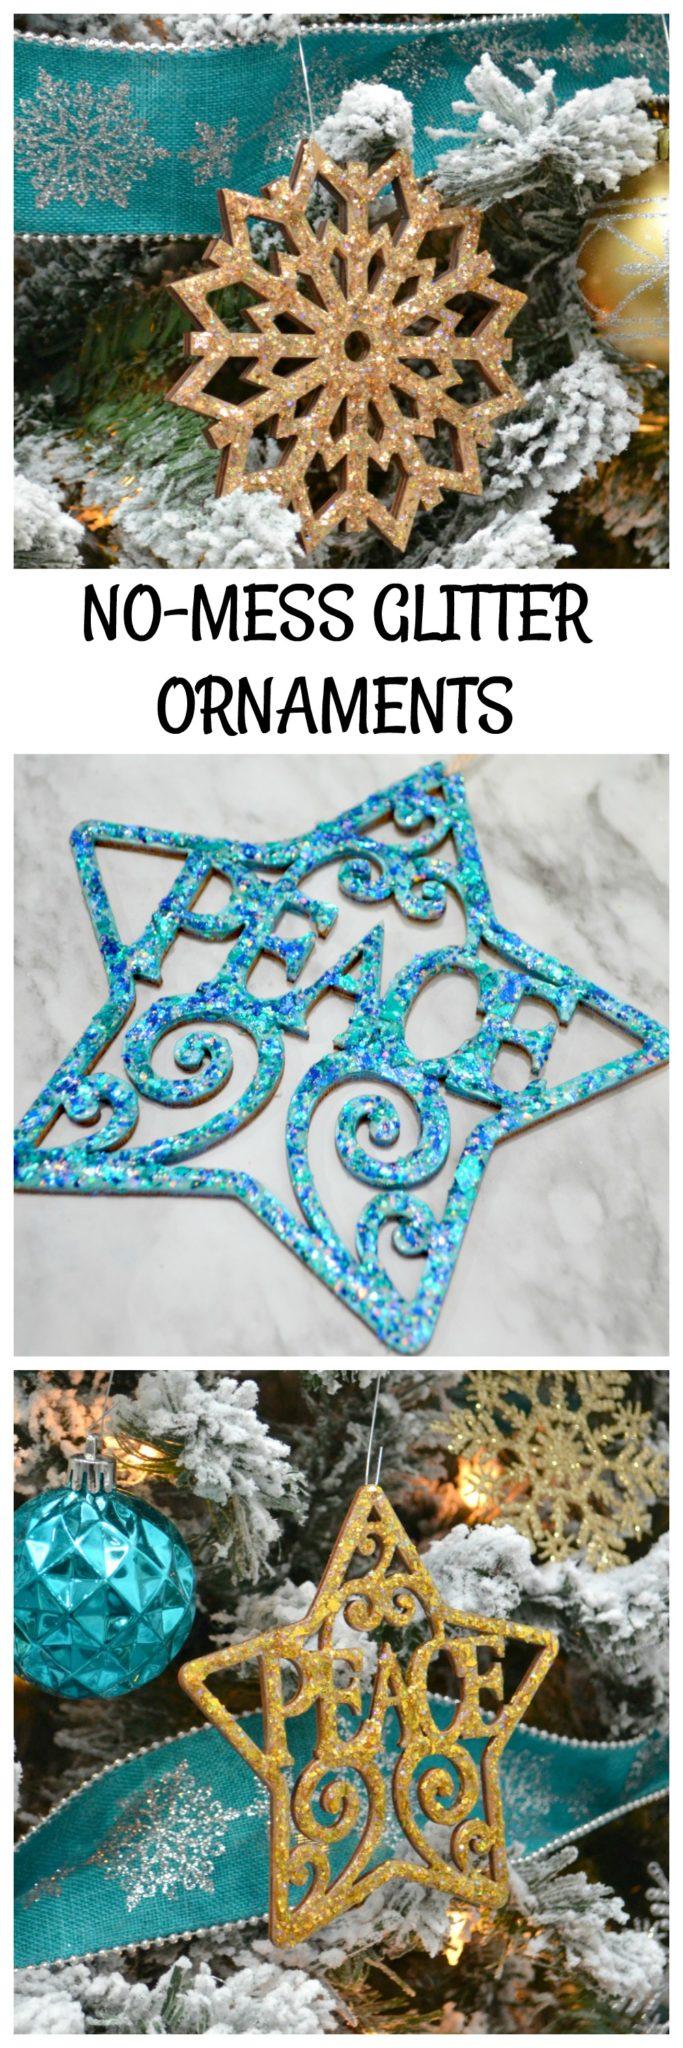 No-Mess Glitter Ornaments